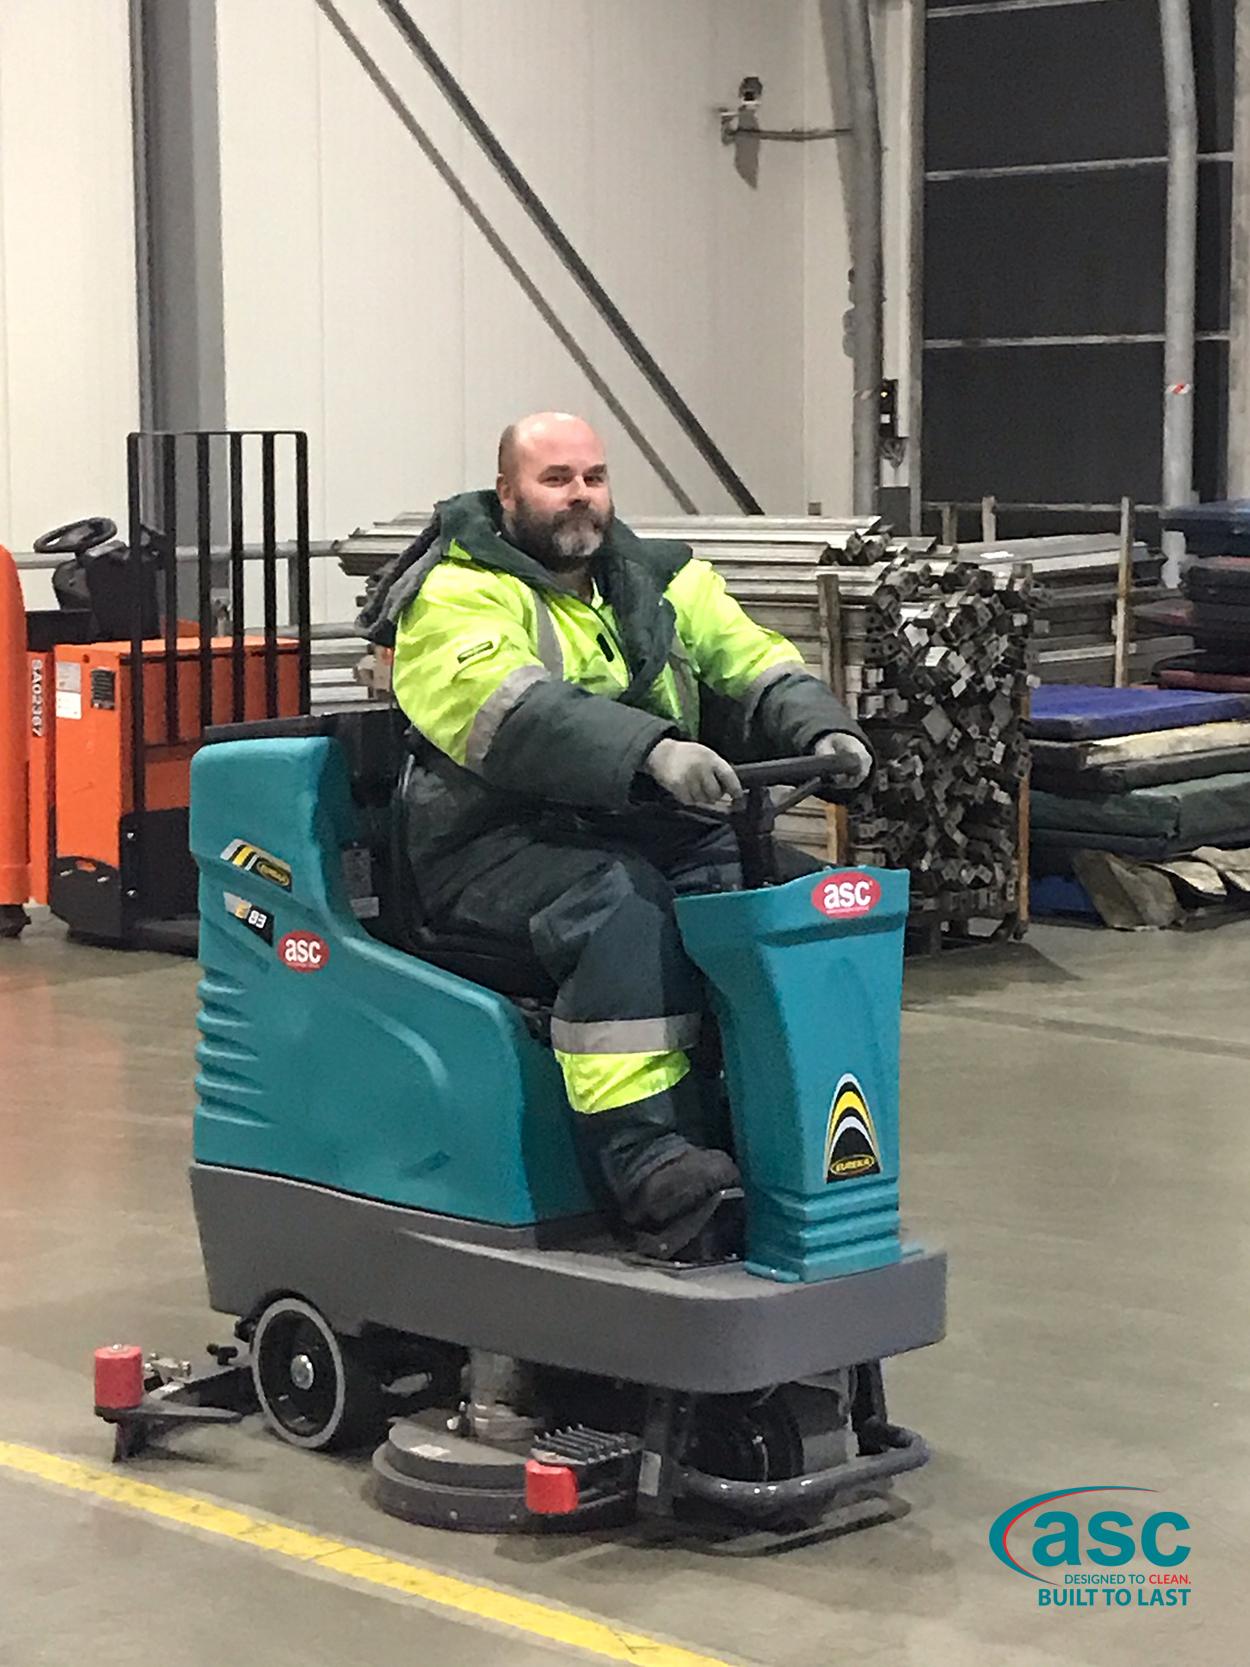 ASC Eureka E 83 Rider Scrubber At AHG's Facility 2